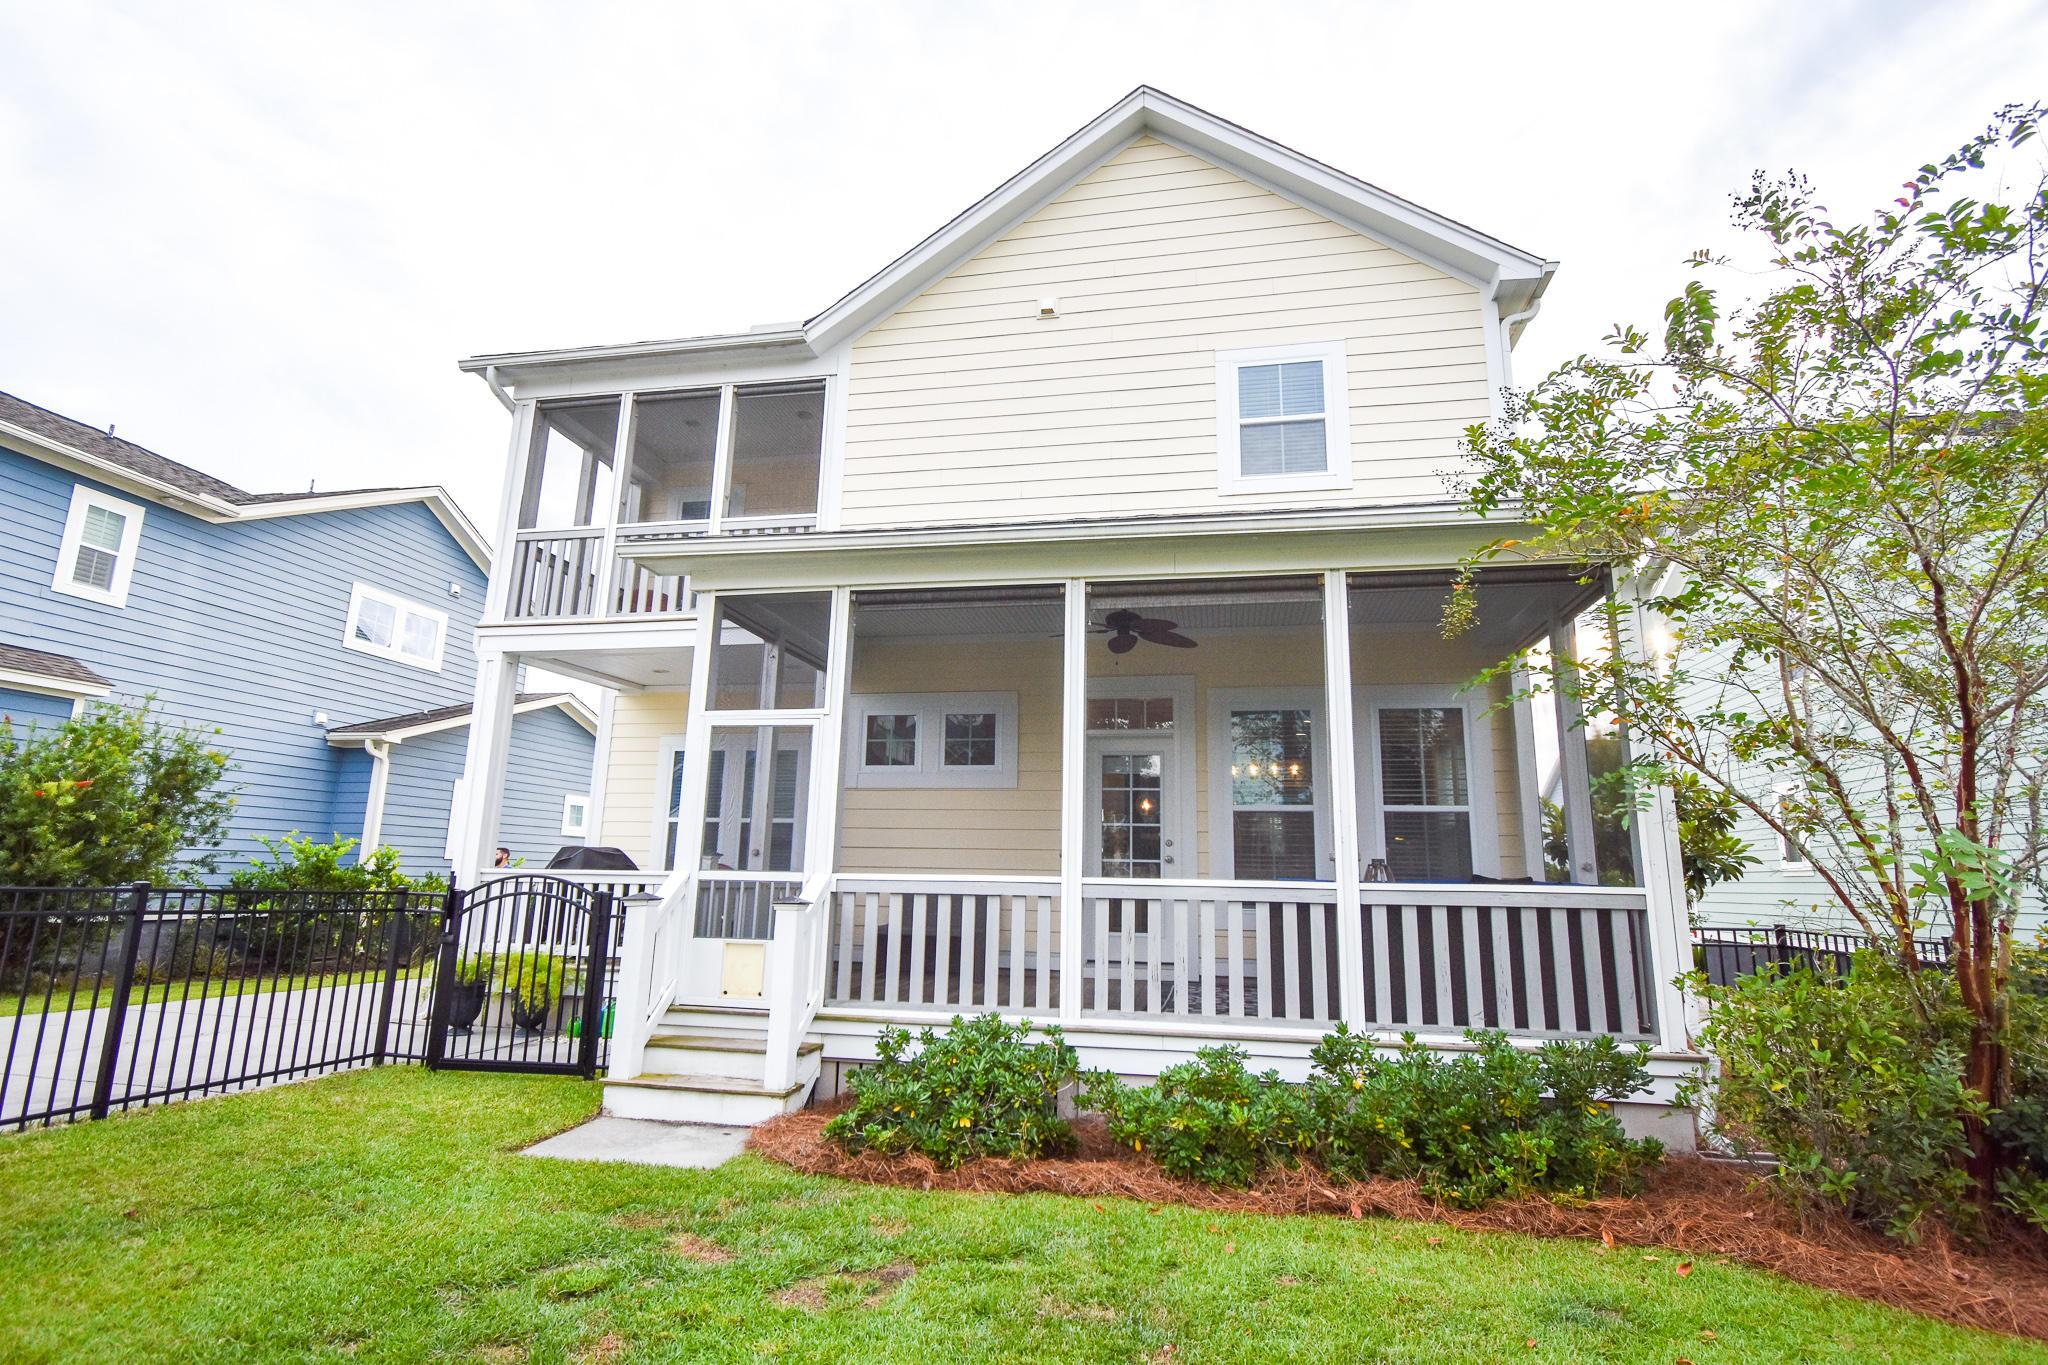 Carolina Park Homes For Sale - 1480 Croaton, Mount Pleasant, SC - 9